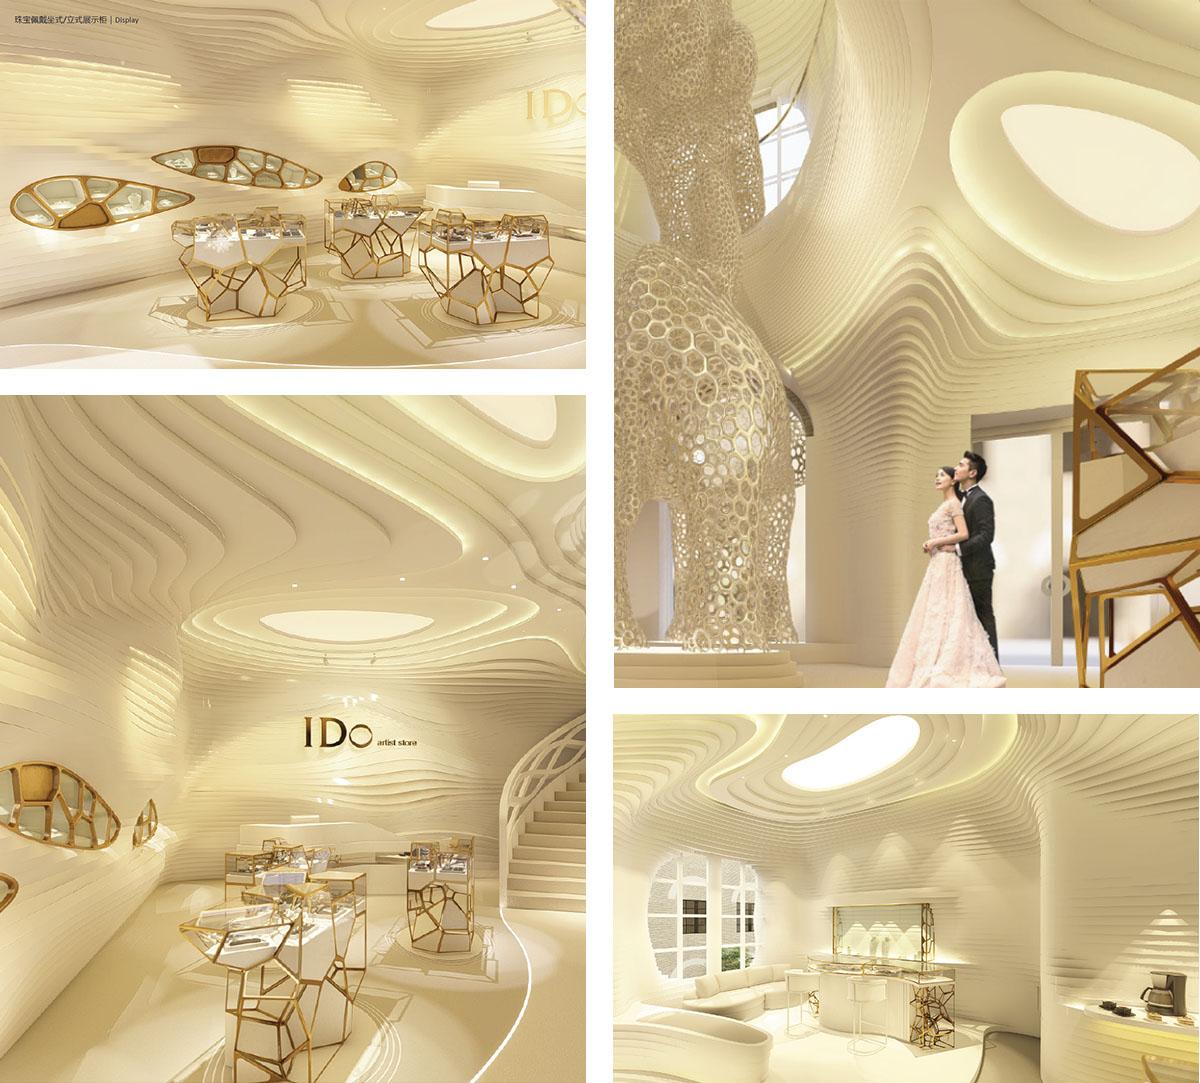 IDO武汉艺术家店